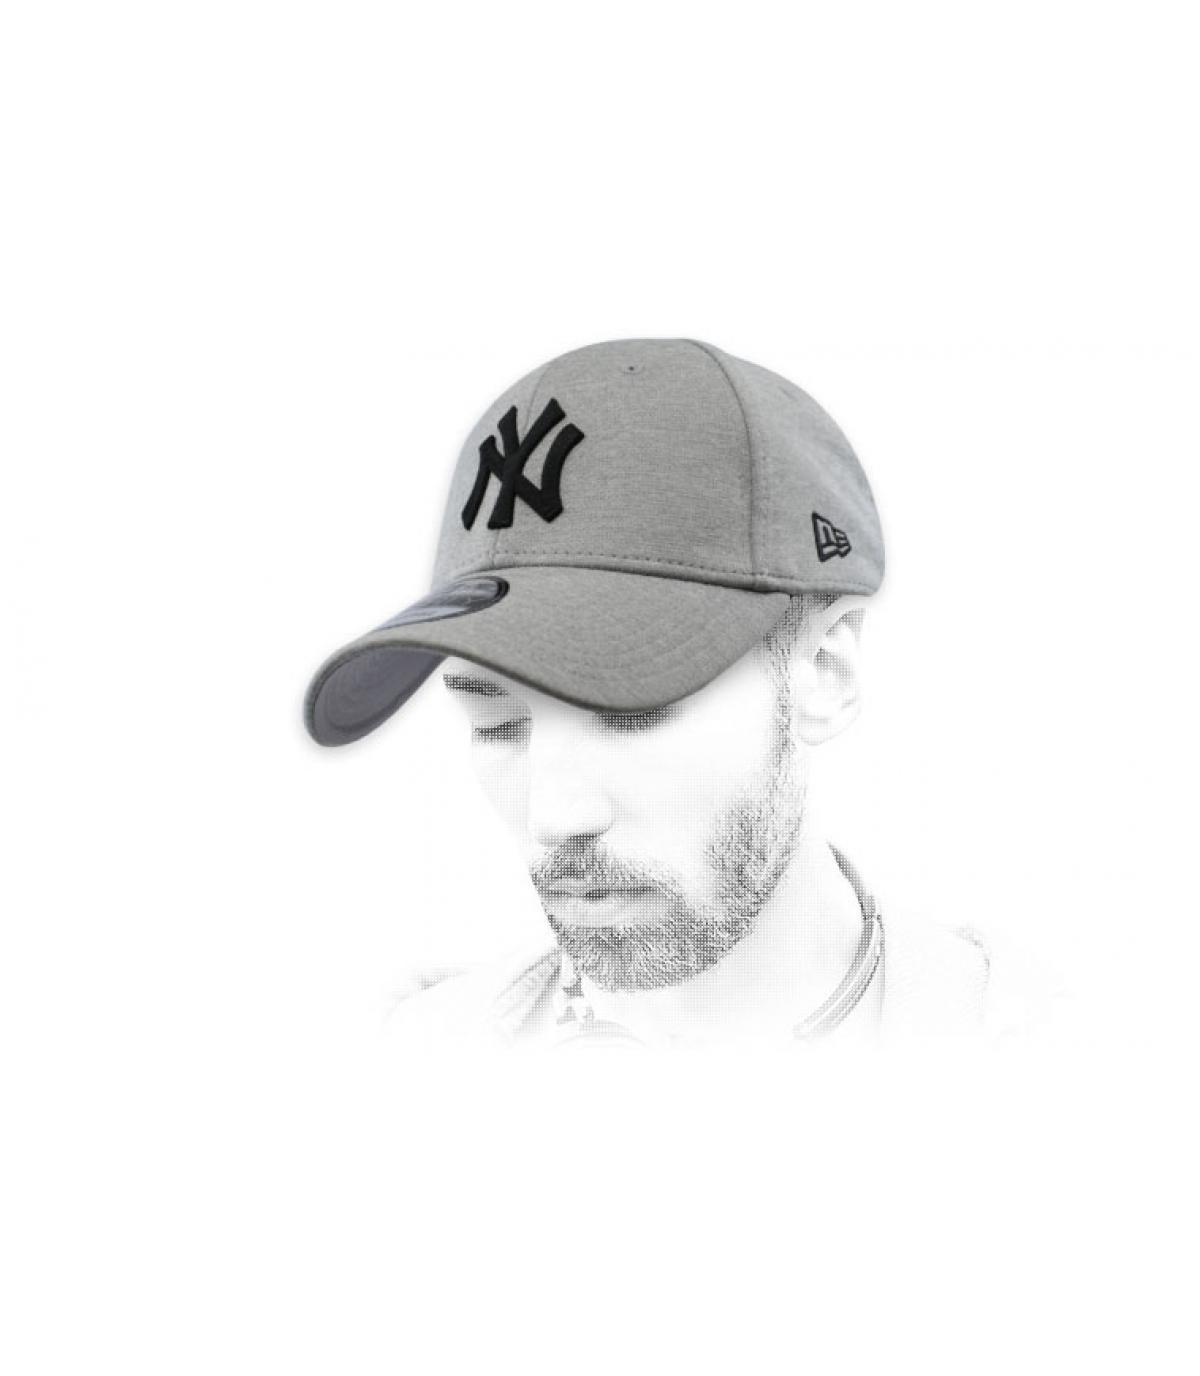 zwart grijze NY cap